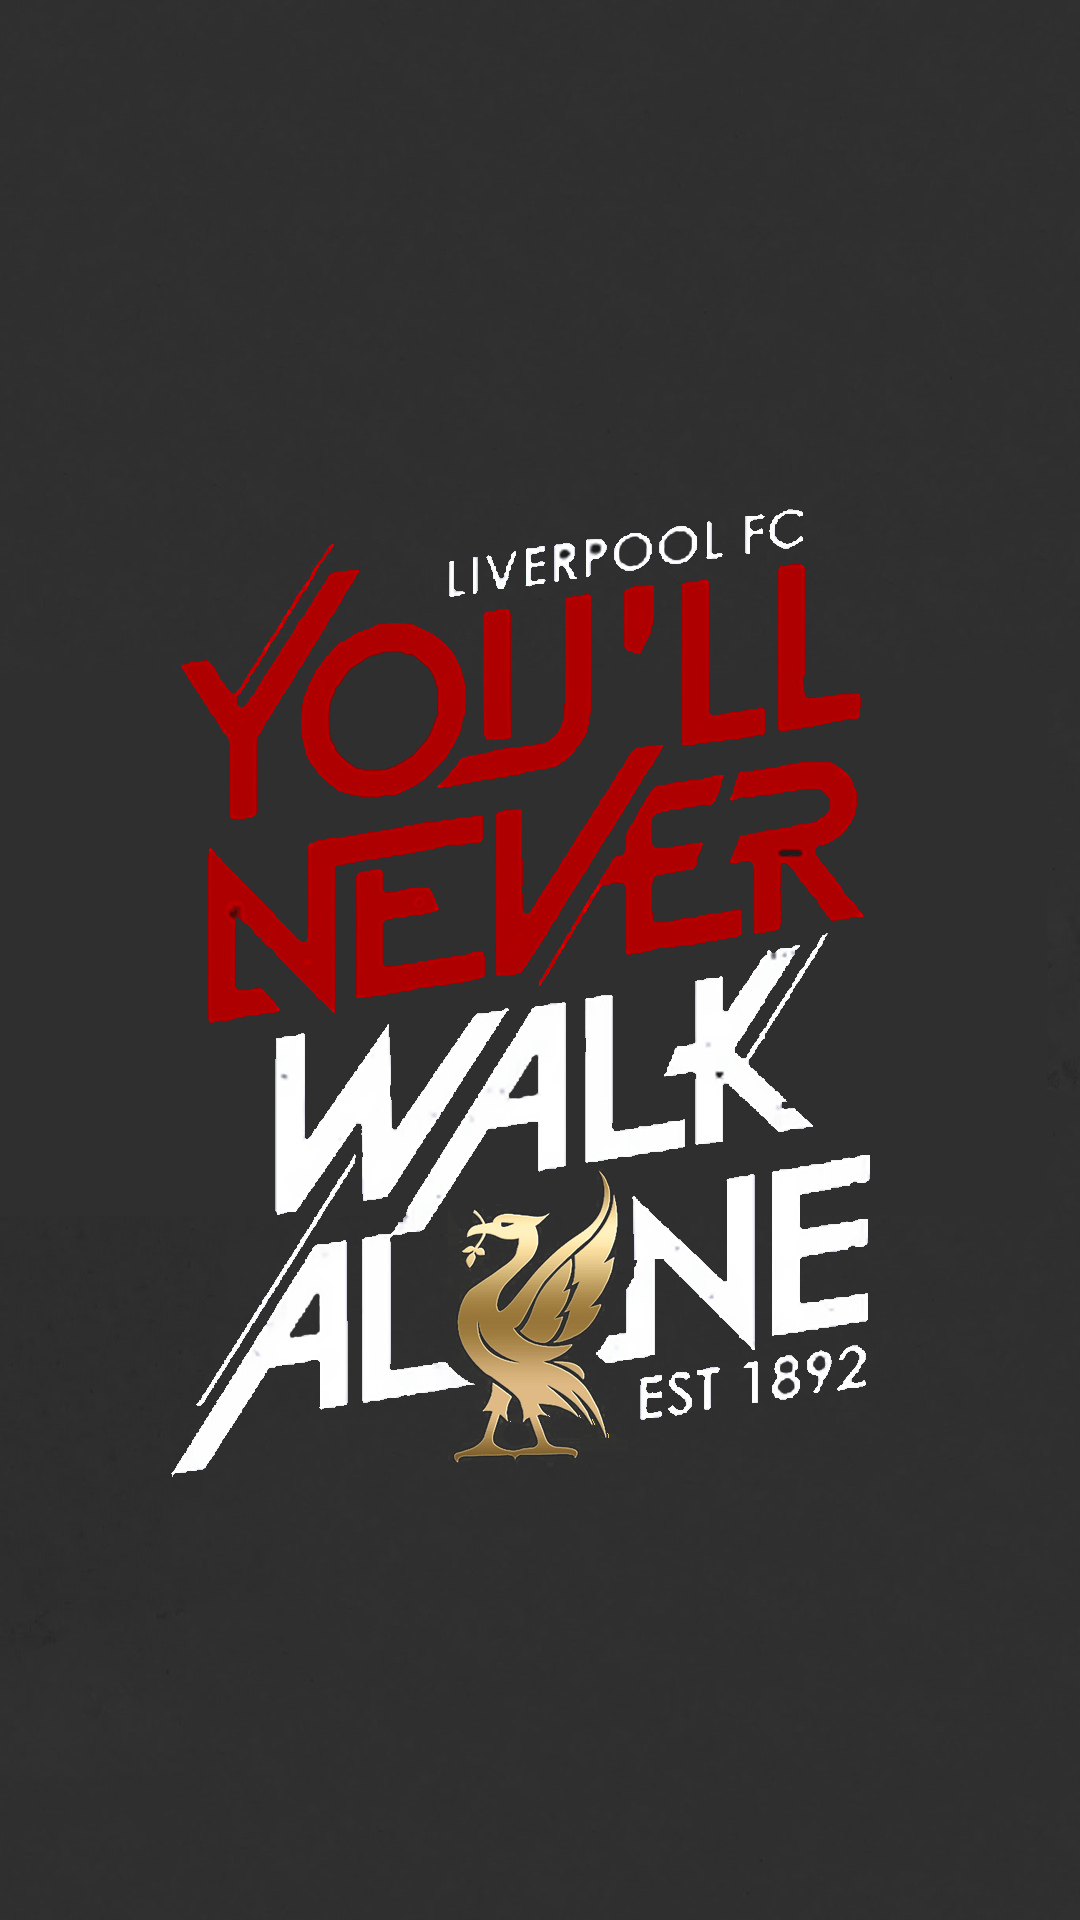 Liverpool Iphone Wallpaper / Liverpool Wallpaper For ...